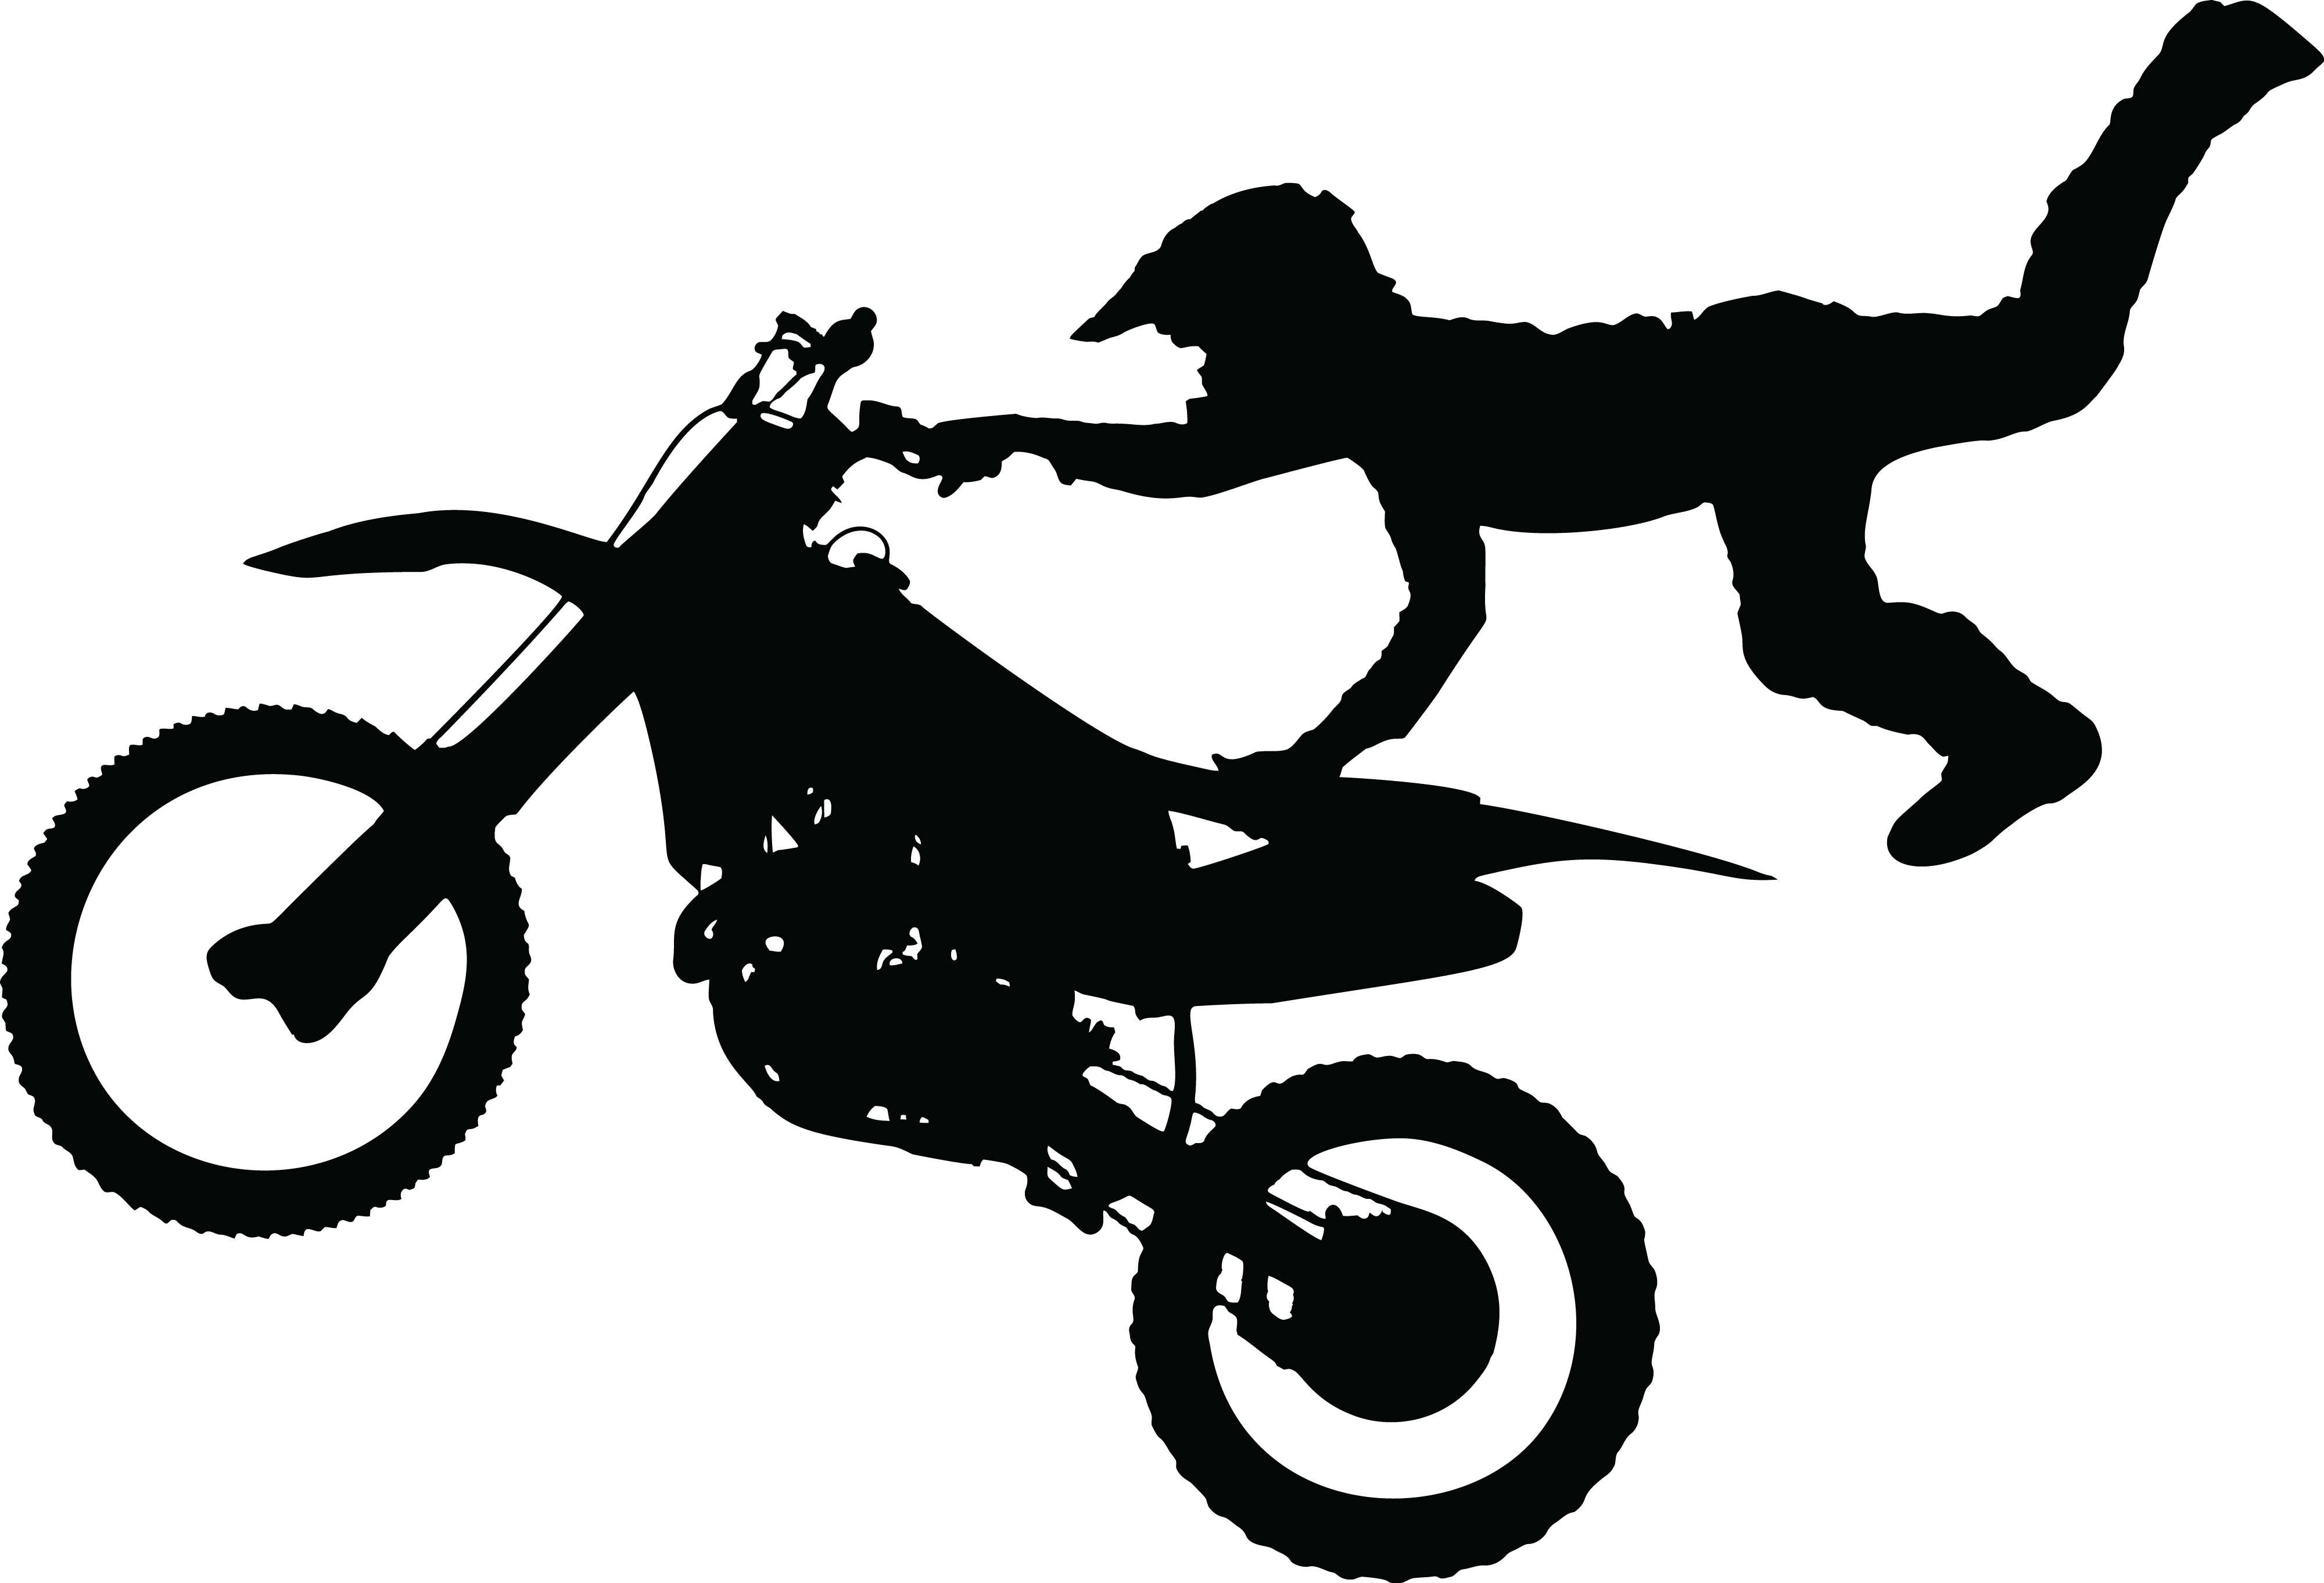 Motor cross clipart free Dirt Bike PNG Free Transparent Dirt Bike.PNG Images. | PlusPNG free